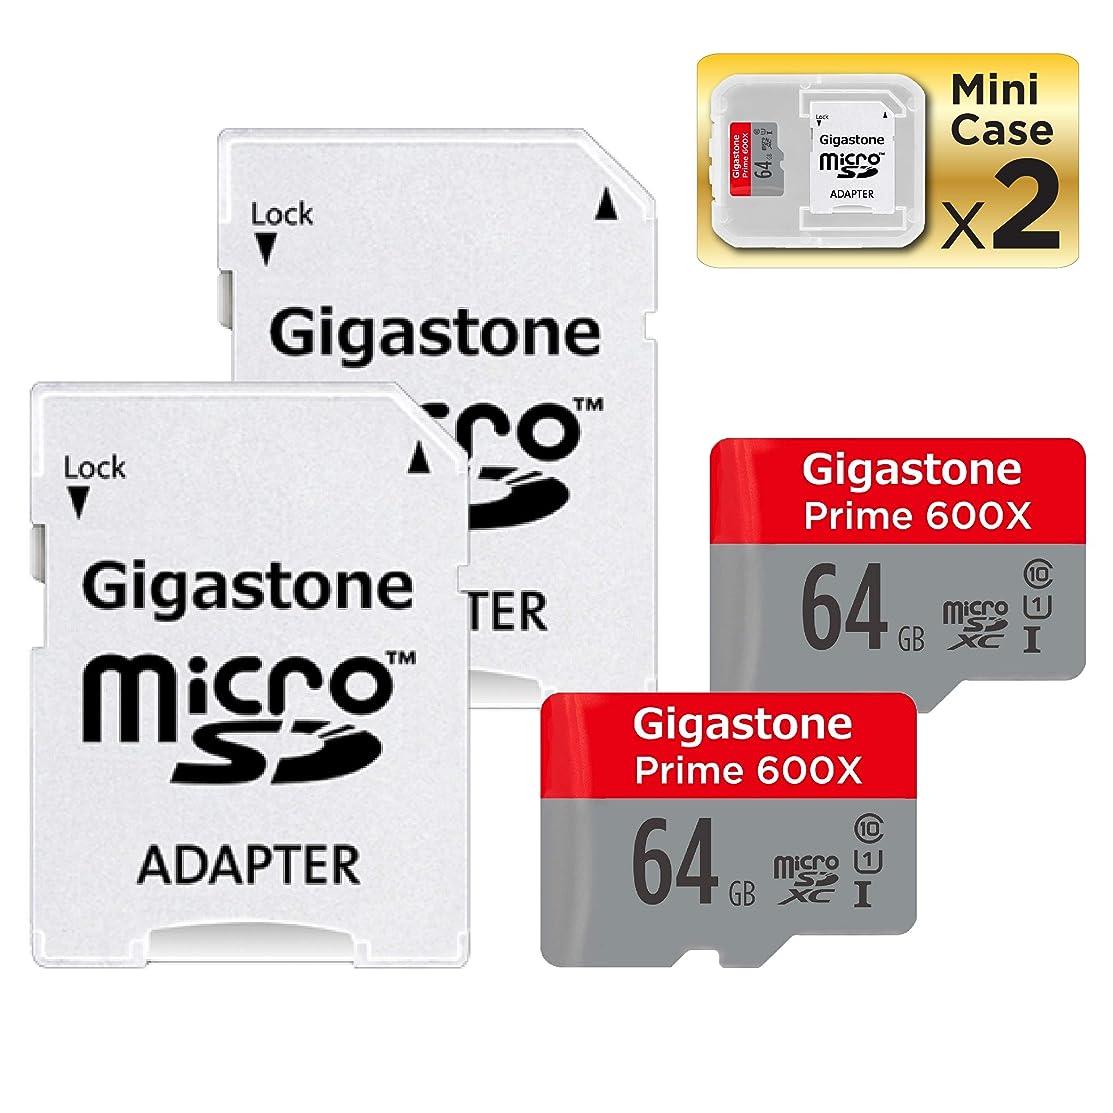 Gigastone Micro SD Card 64GB 2-Pack Micro SDHC U1 C10 with Mini Case and MicroSD to SD Adapter High Speed Memory Card Class 10 UHS-I Full HD Video Nintendo Gopro Camera Samsung Canon Nikon DJI Drone